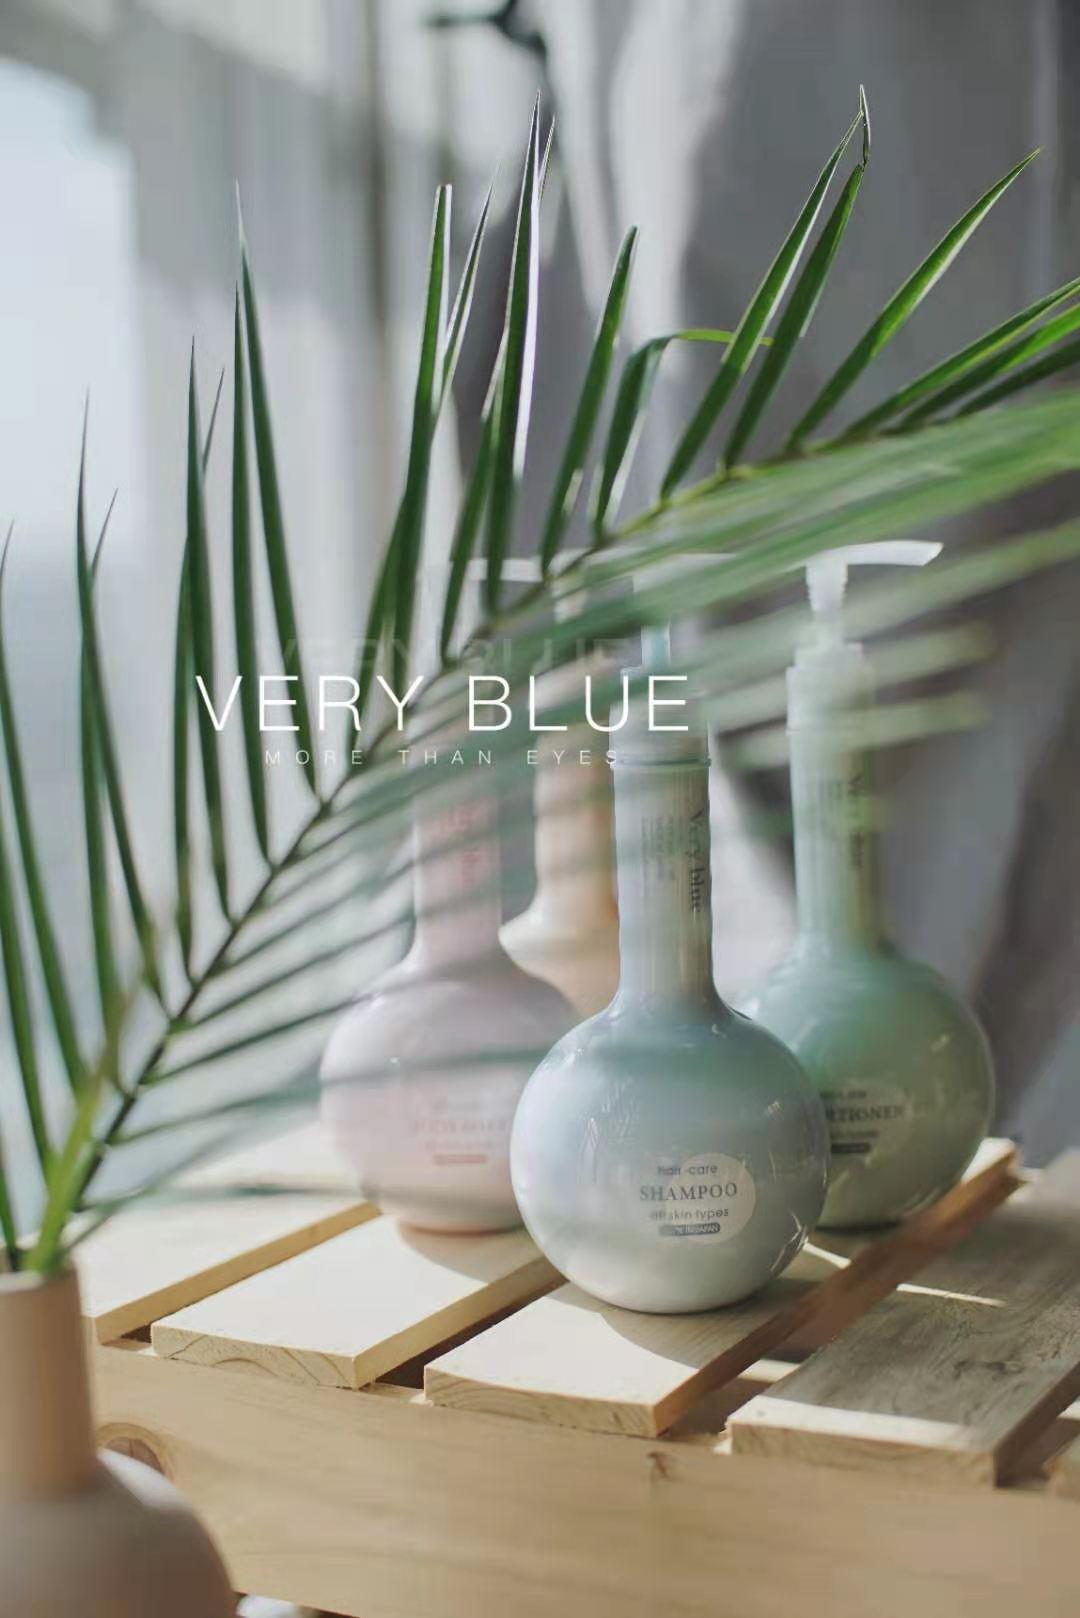 NIMI VeryBlue洗护产品去皱纹有用吗